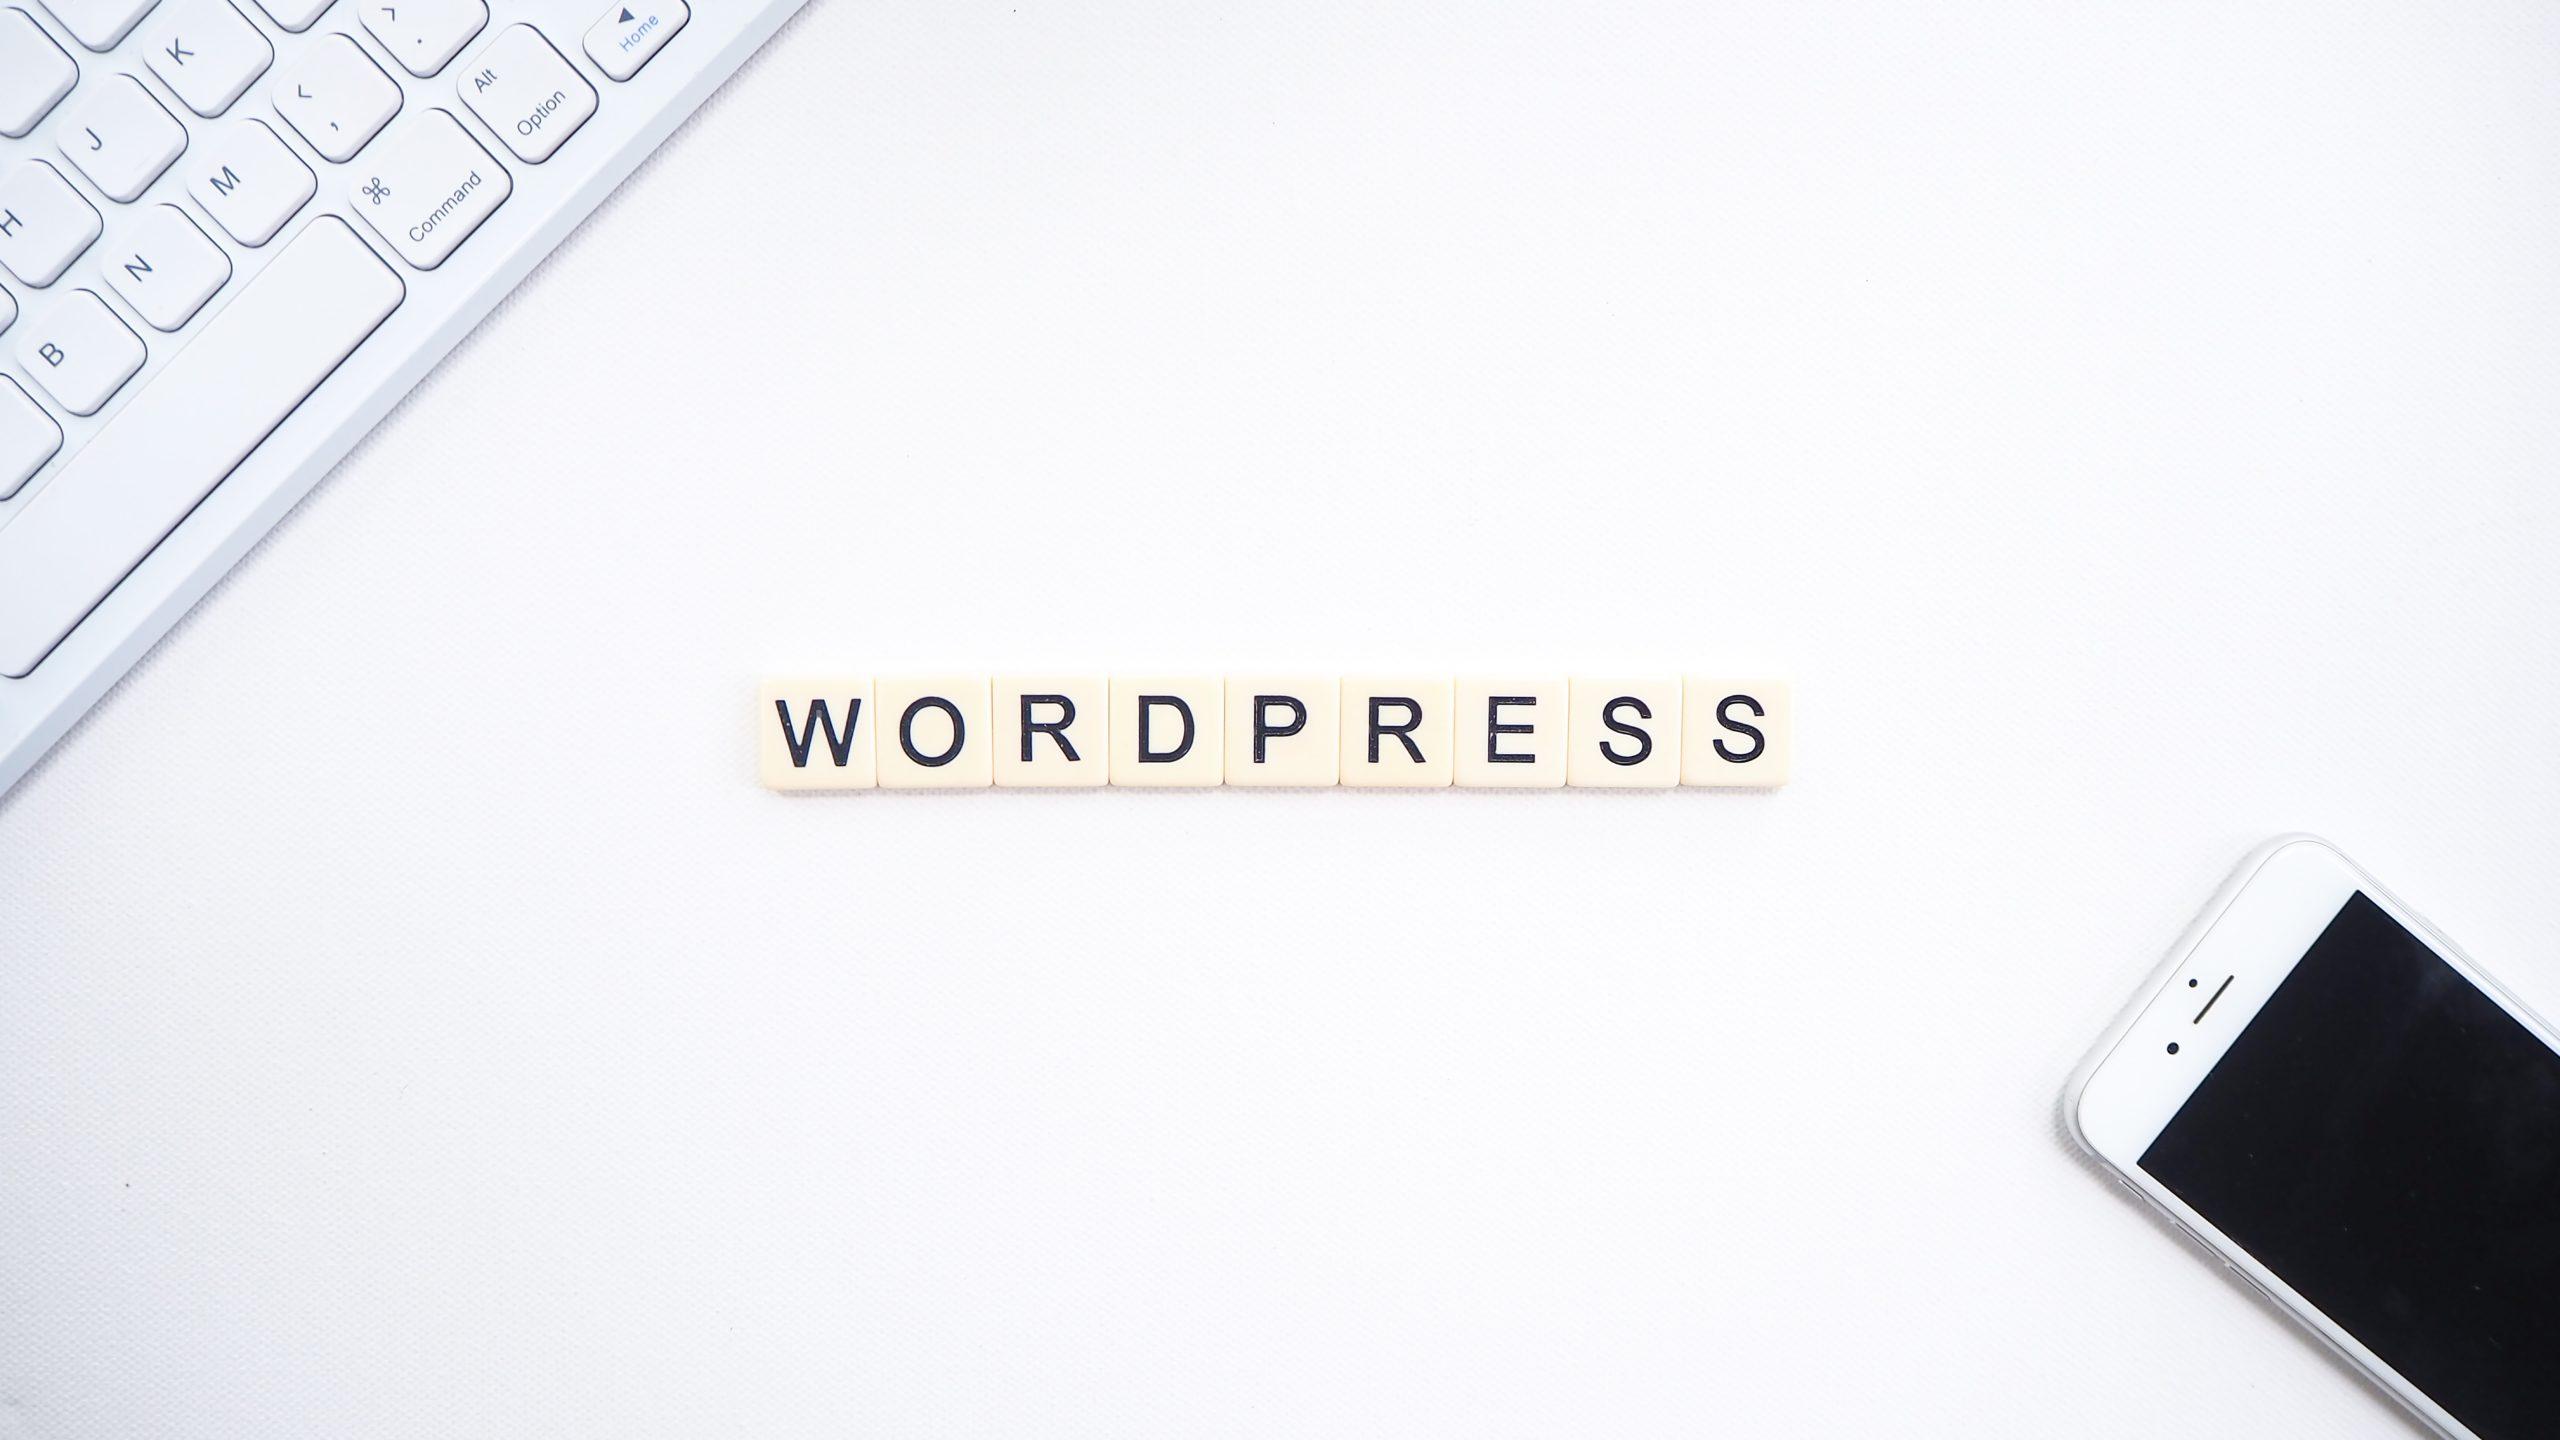 wordpressの作成画像